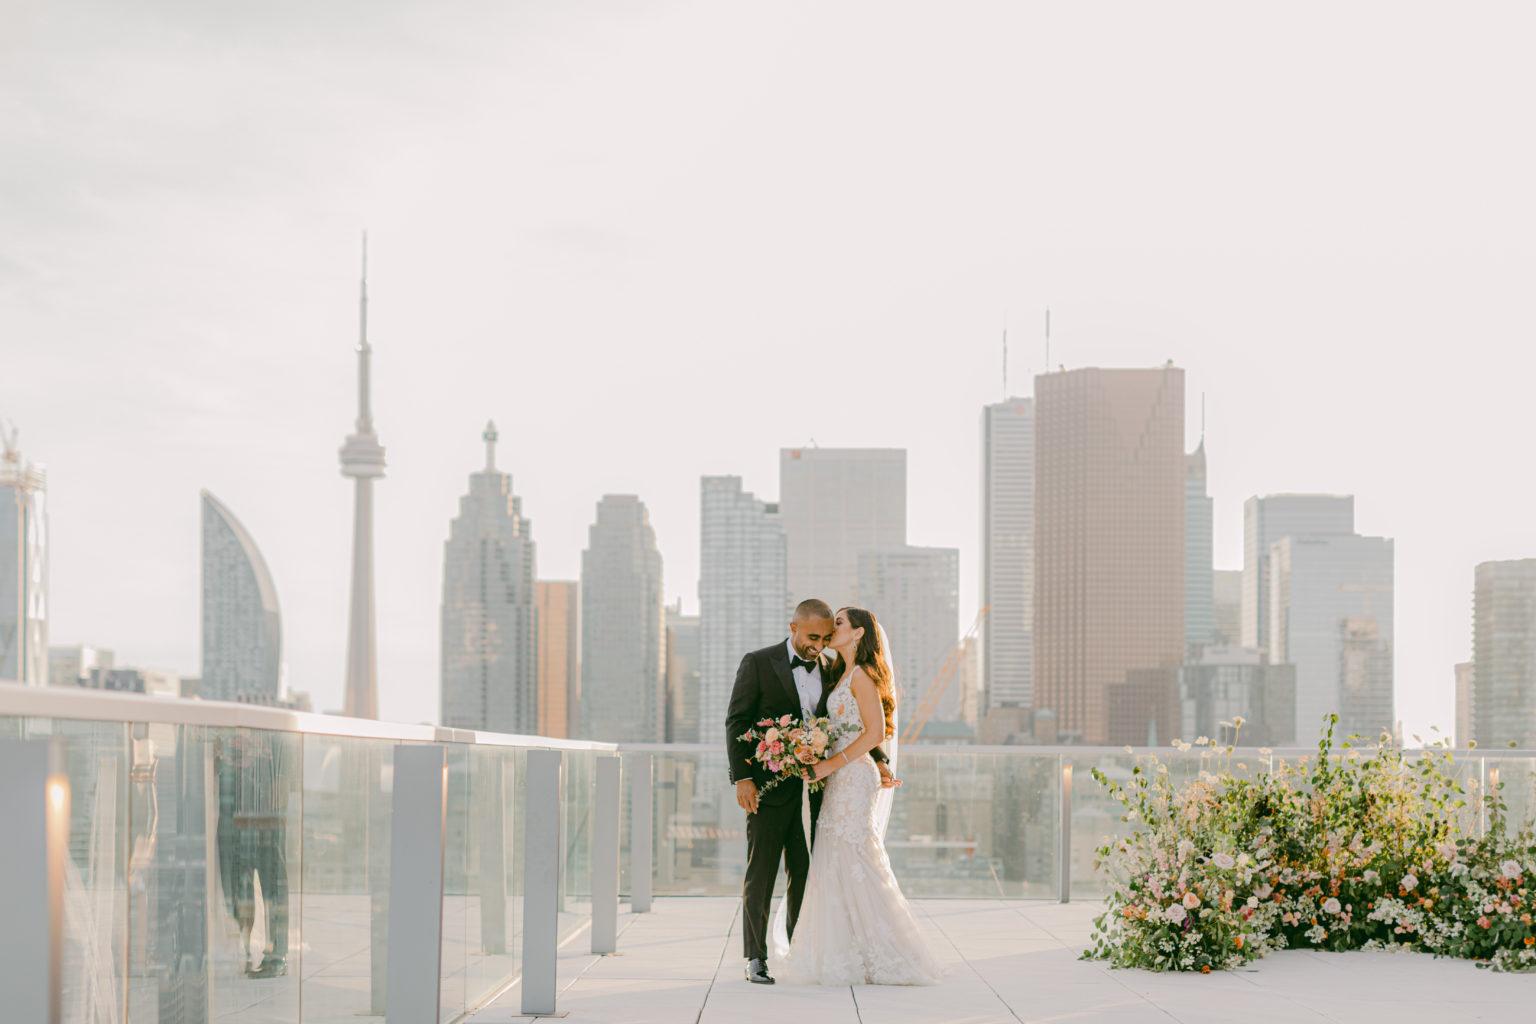 Globe and Mail Centre wedding venue